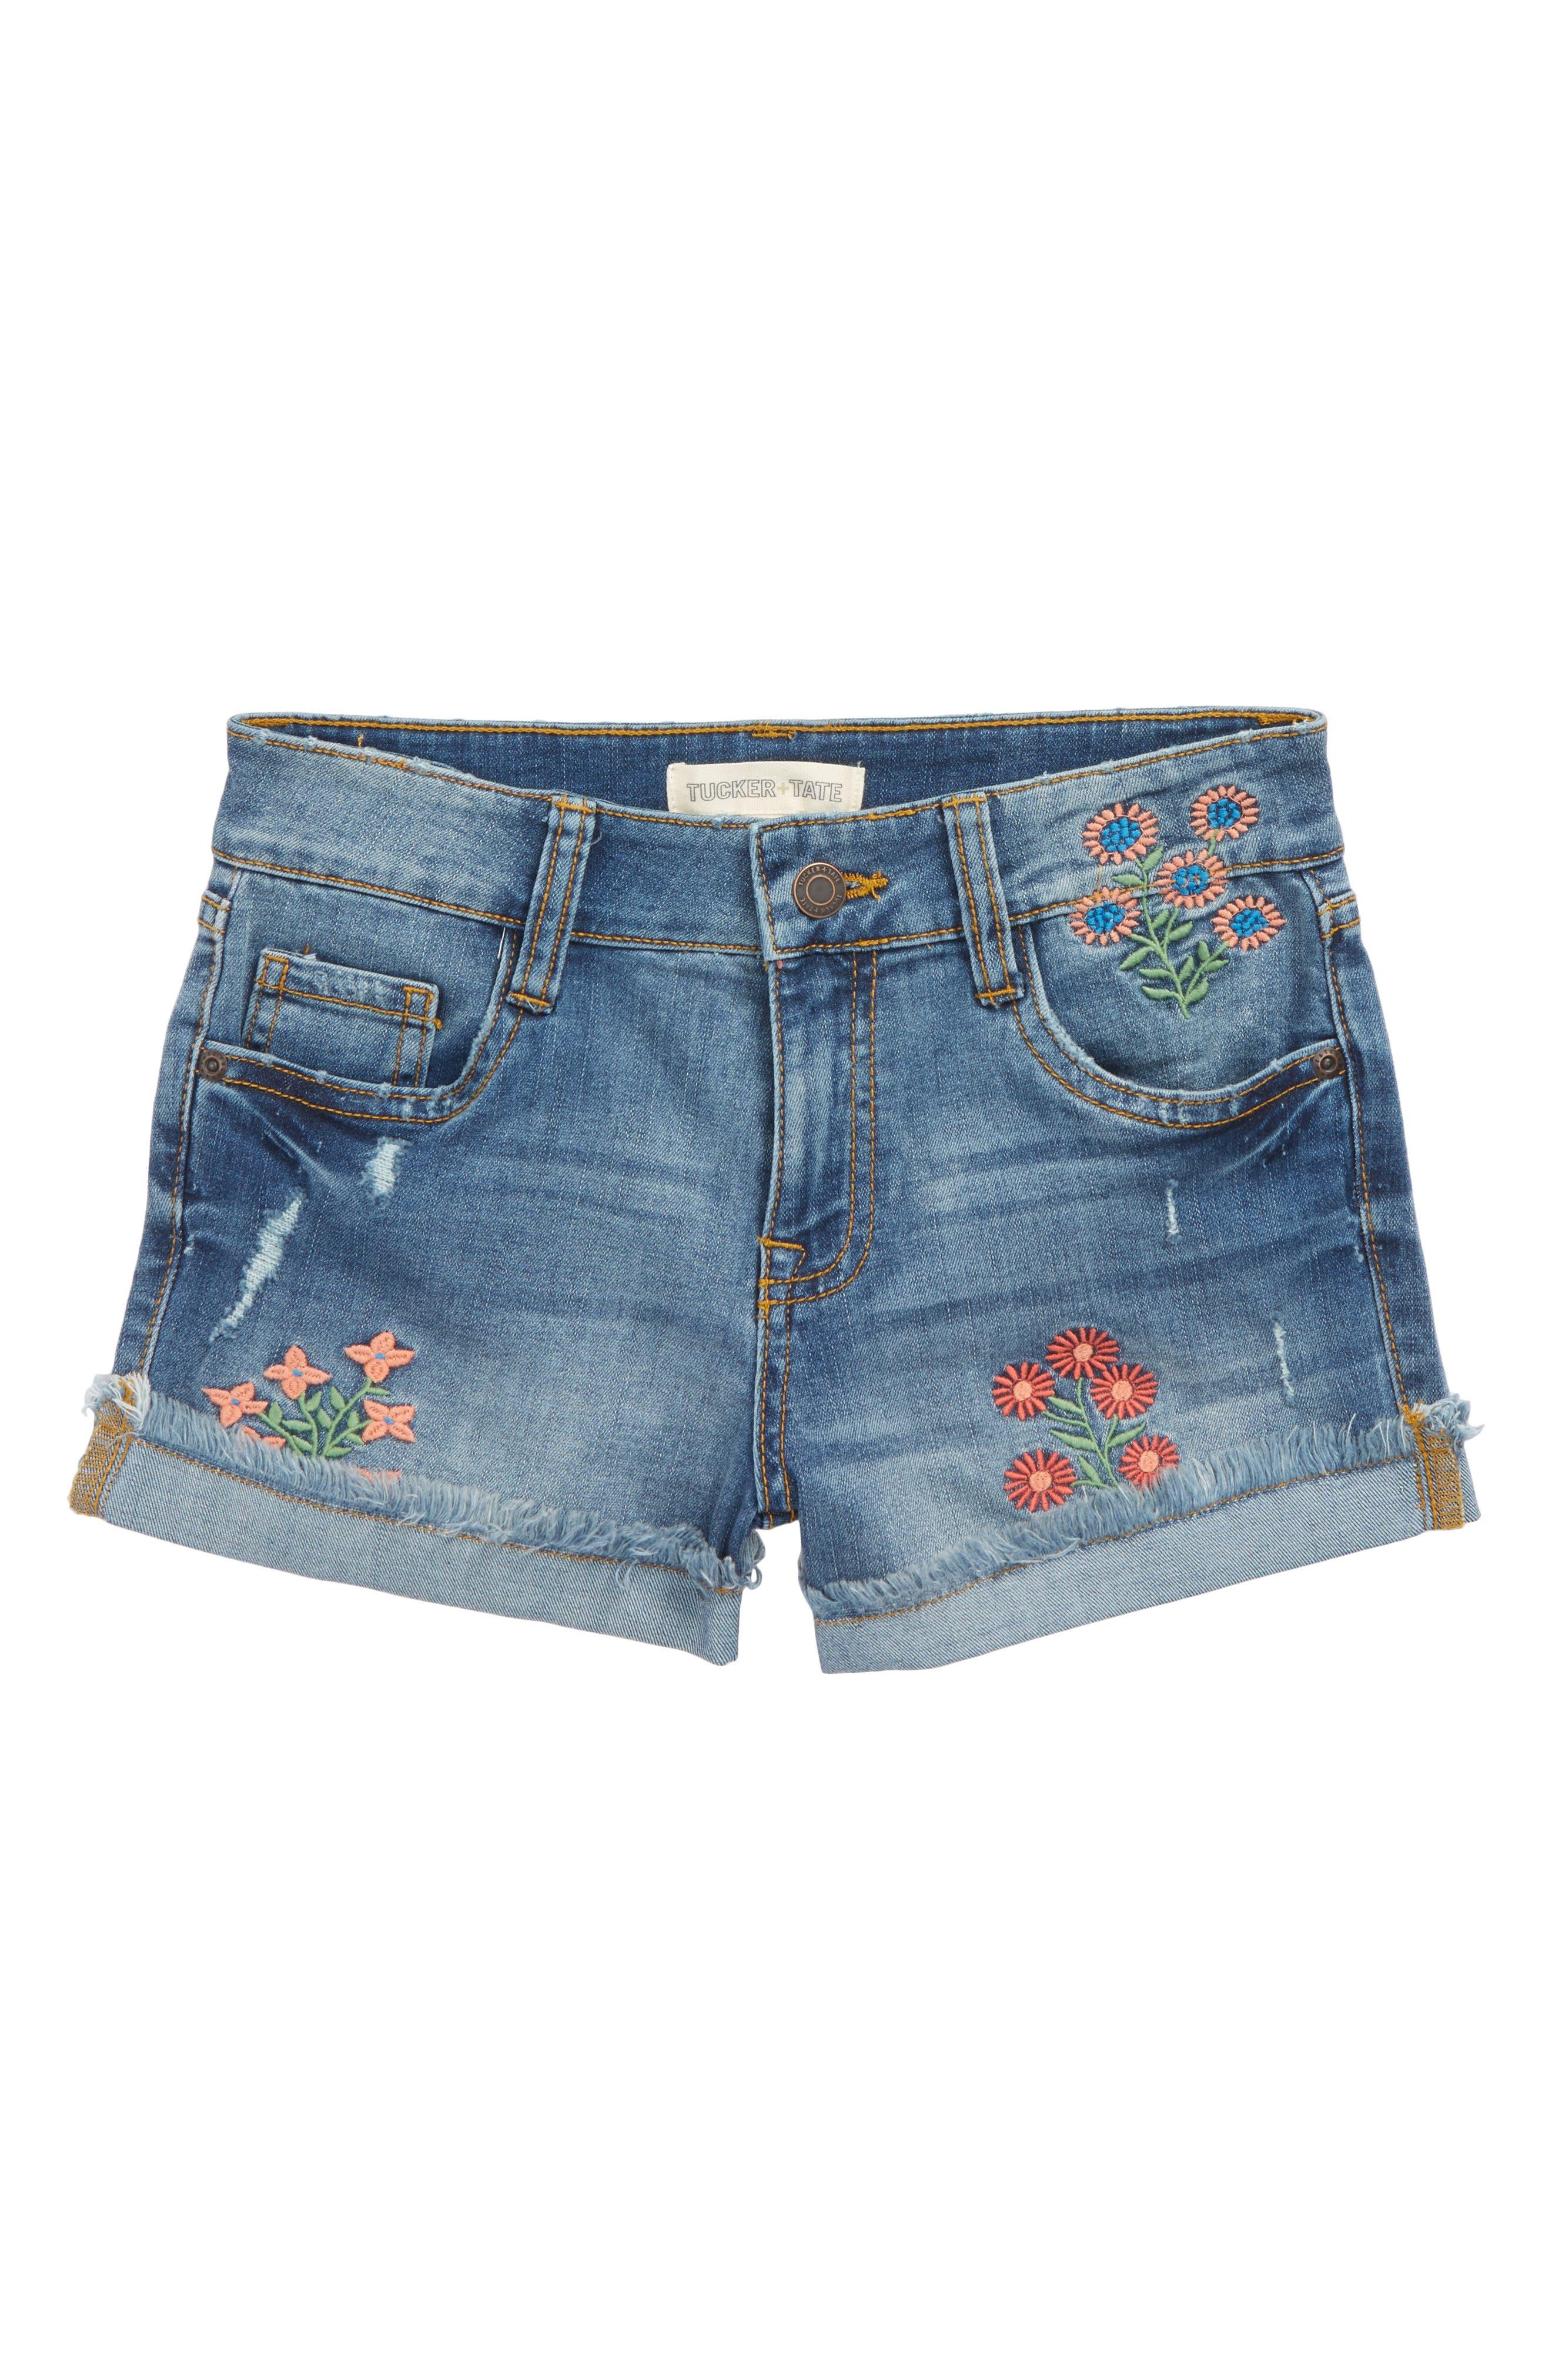 Flower Embroidered Denim Shorts,                         Main,                         color, 450